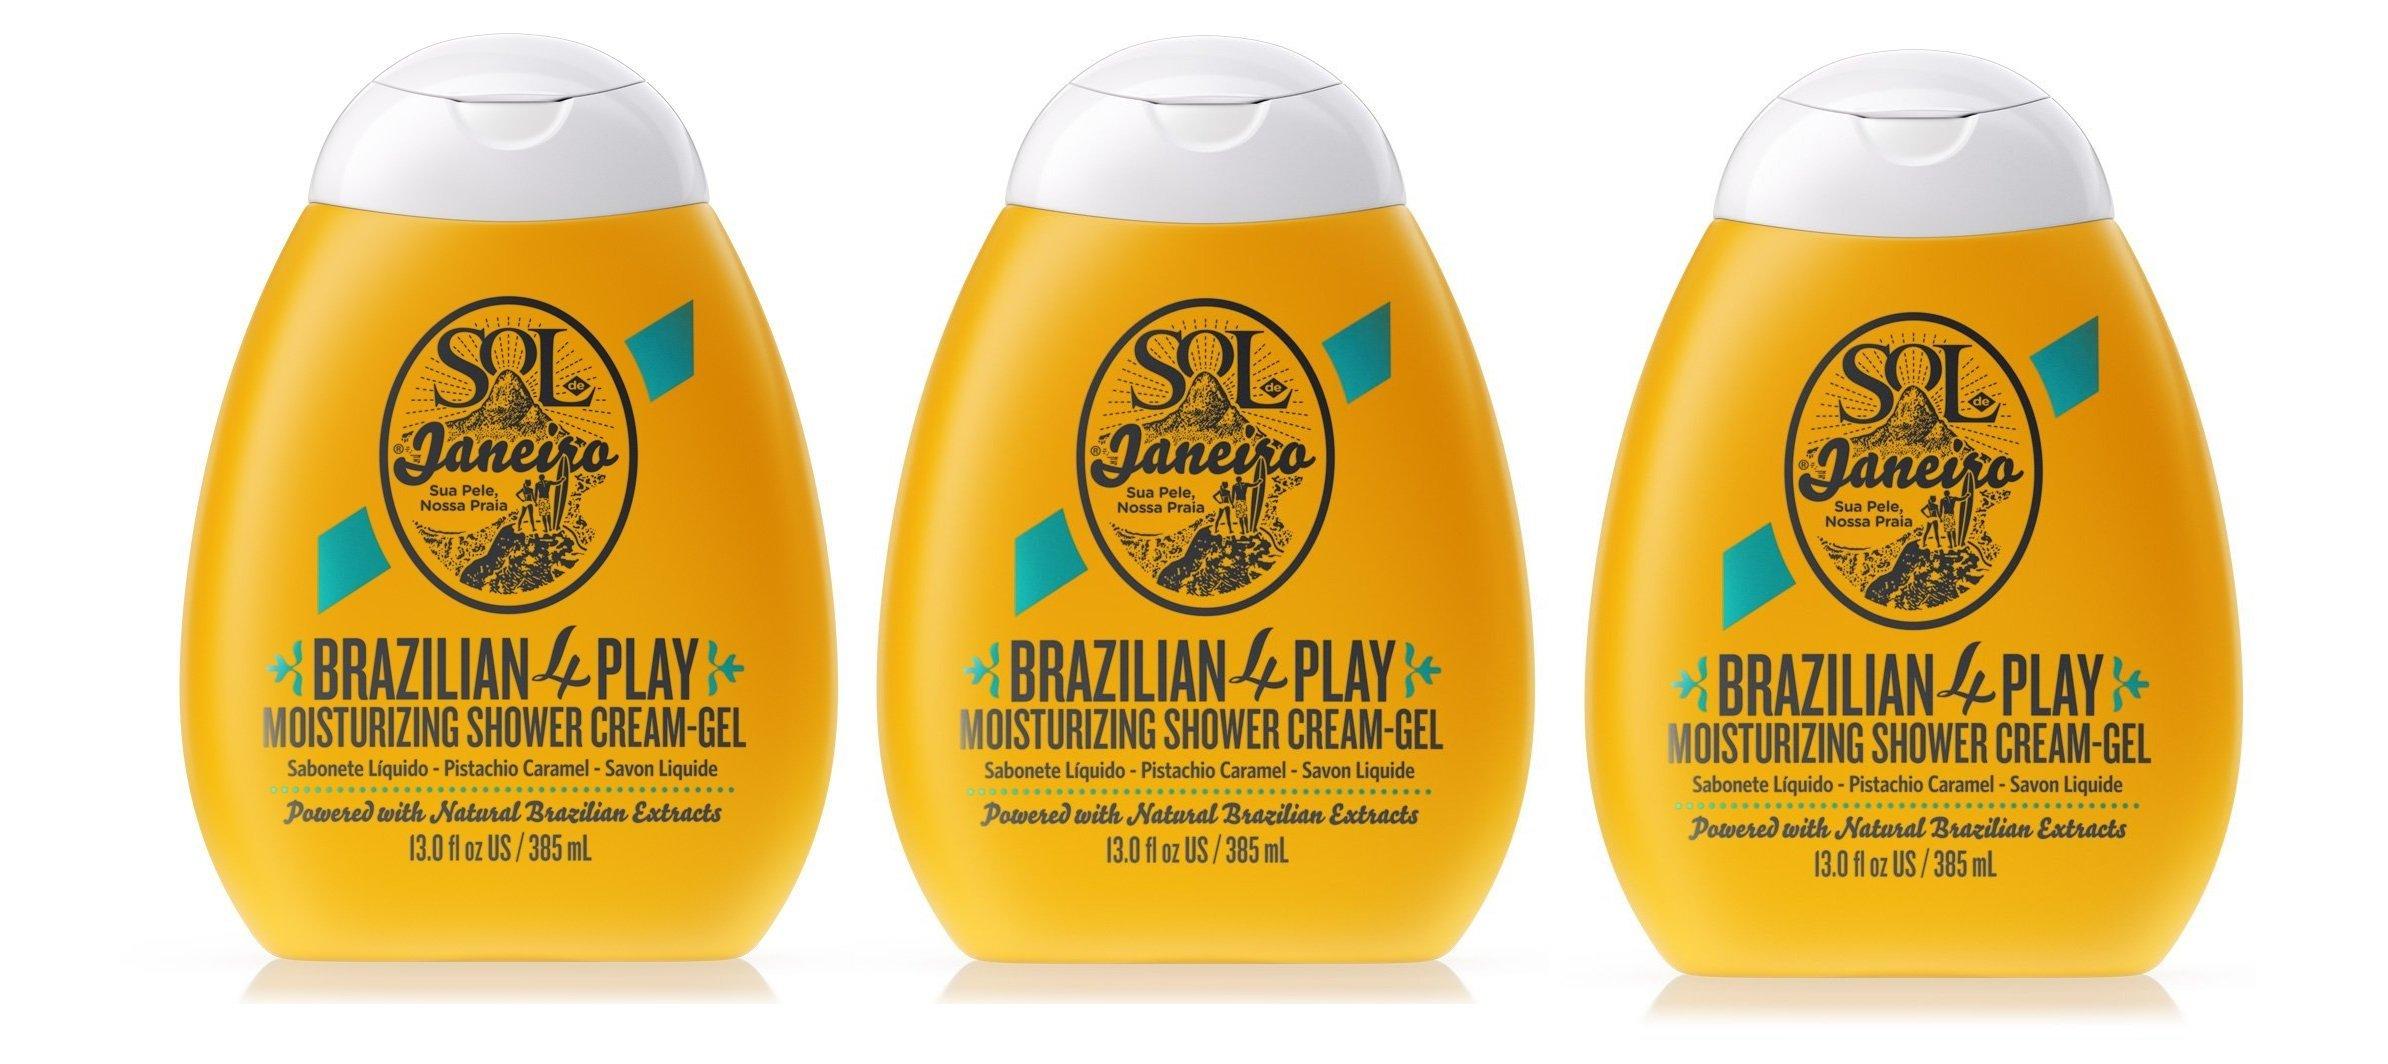 Amazon.com : Sol de Janeiro Brazilian 4 Play Moisturizing Shower Cream-Gel (3 pack) : Beauty